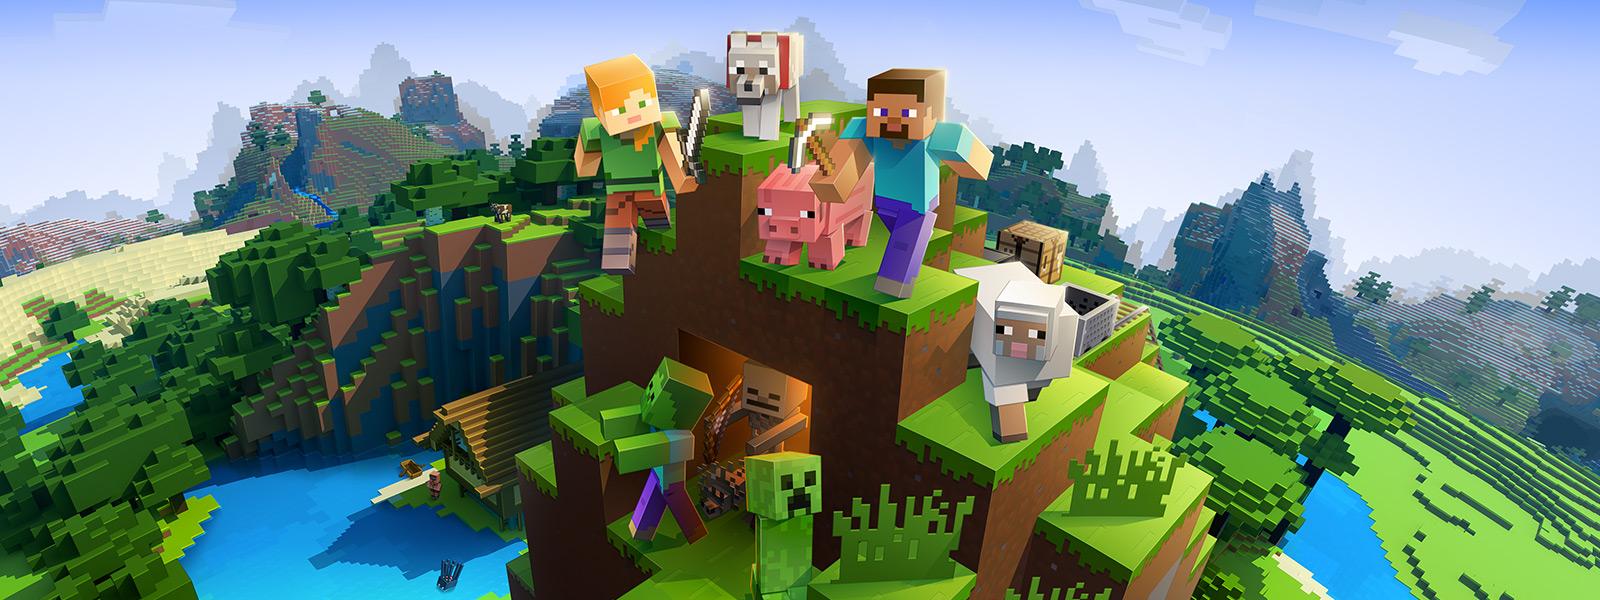 Minecraft-seikkailuja